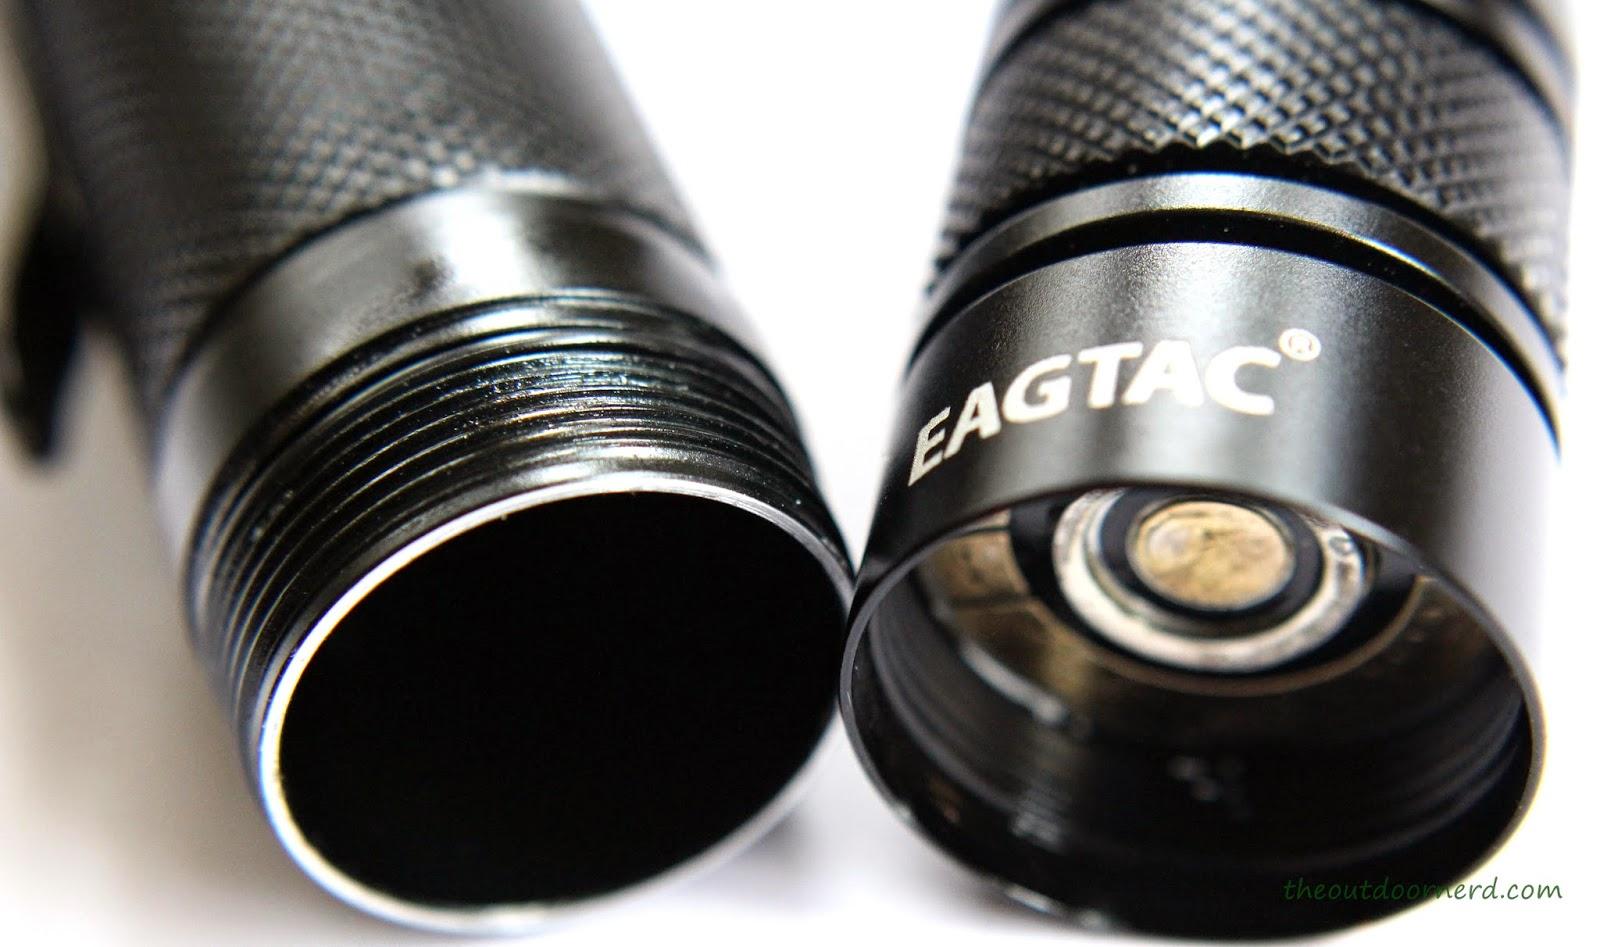 EagleTac D25LC2 Mini 18650 Flashlight Product Image 5